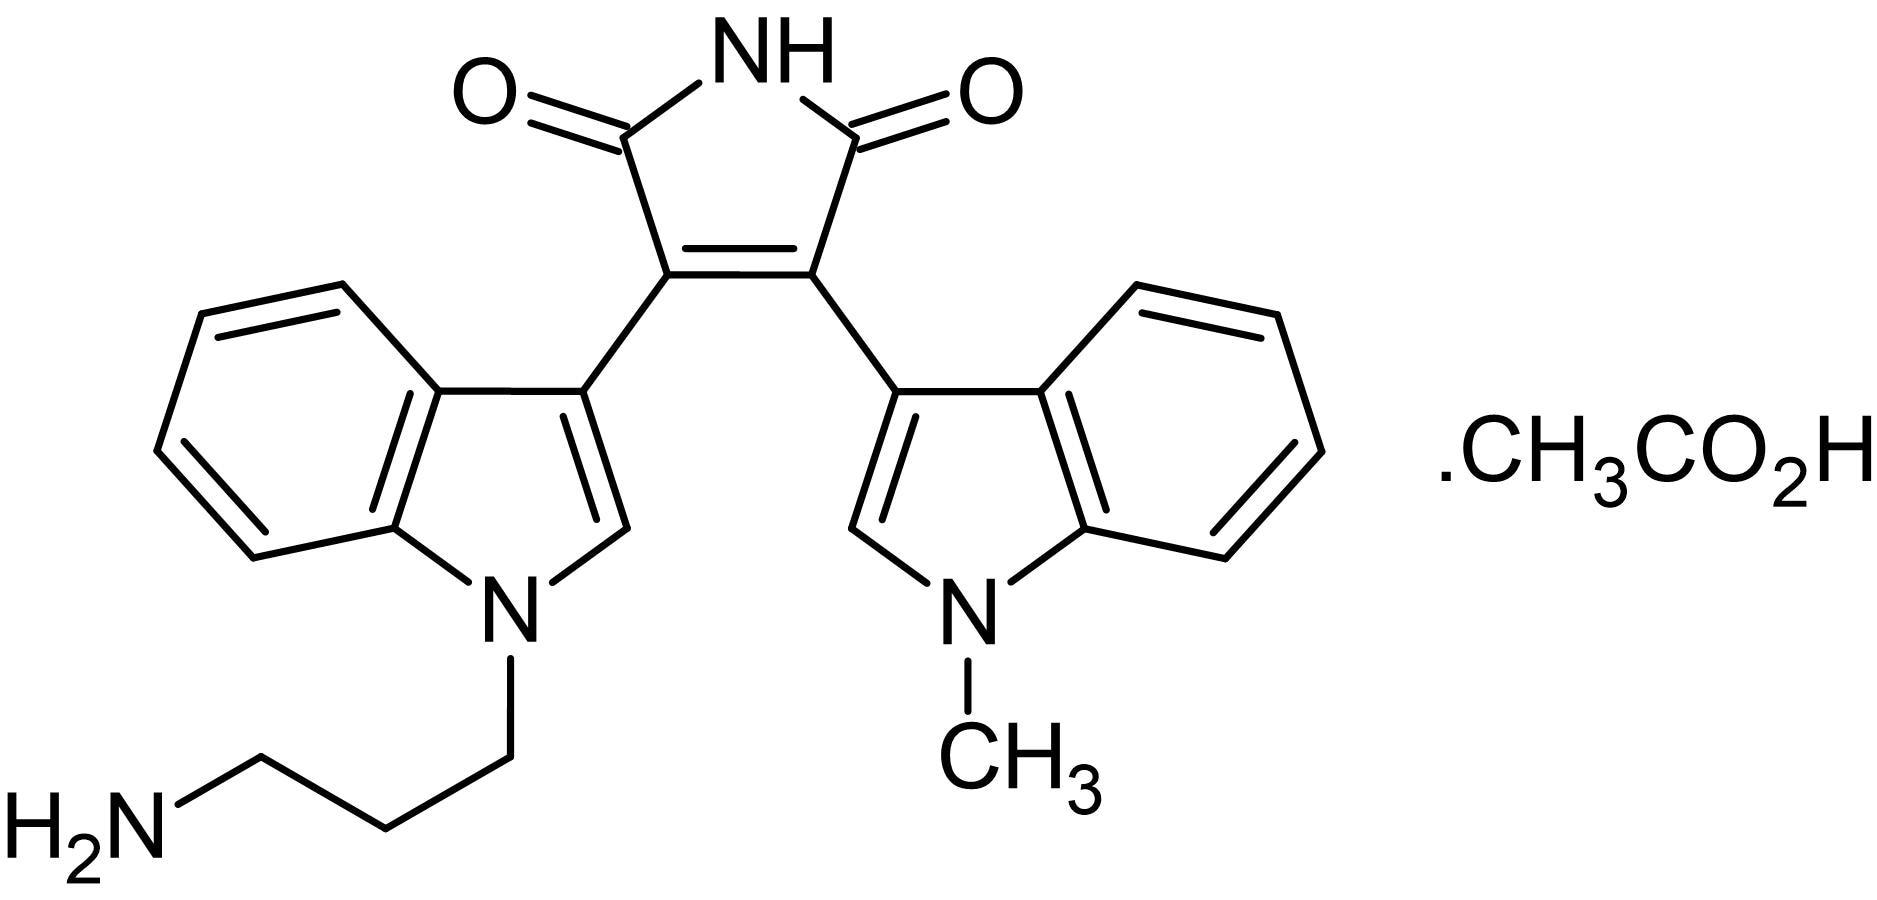 Chemical Structure - Bisindolylmaleimide VIII acetate, PKC inhibitor (ab143782)